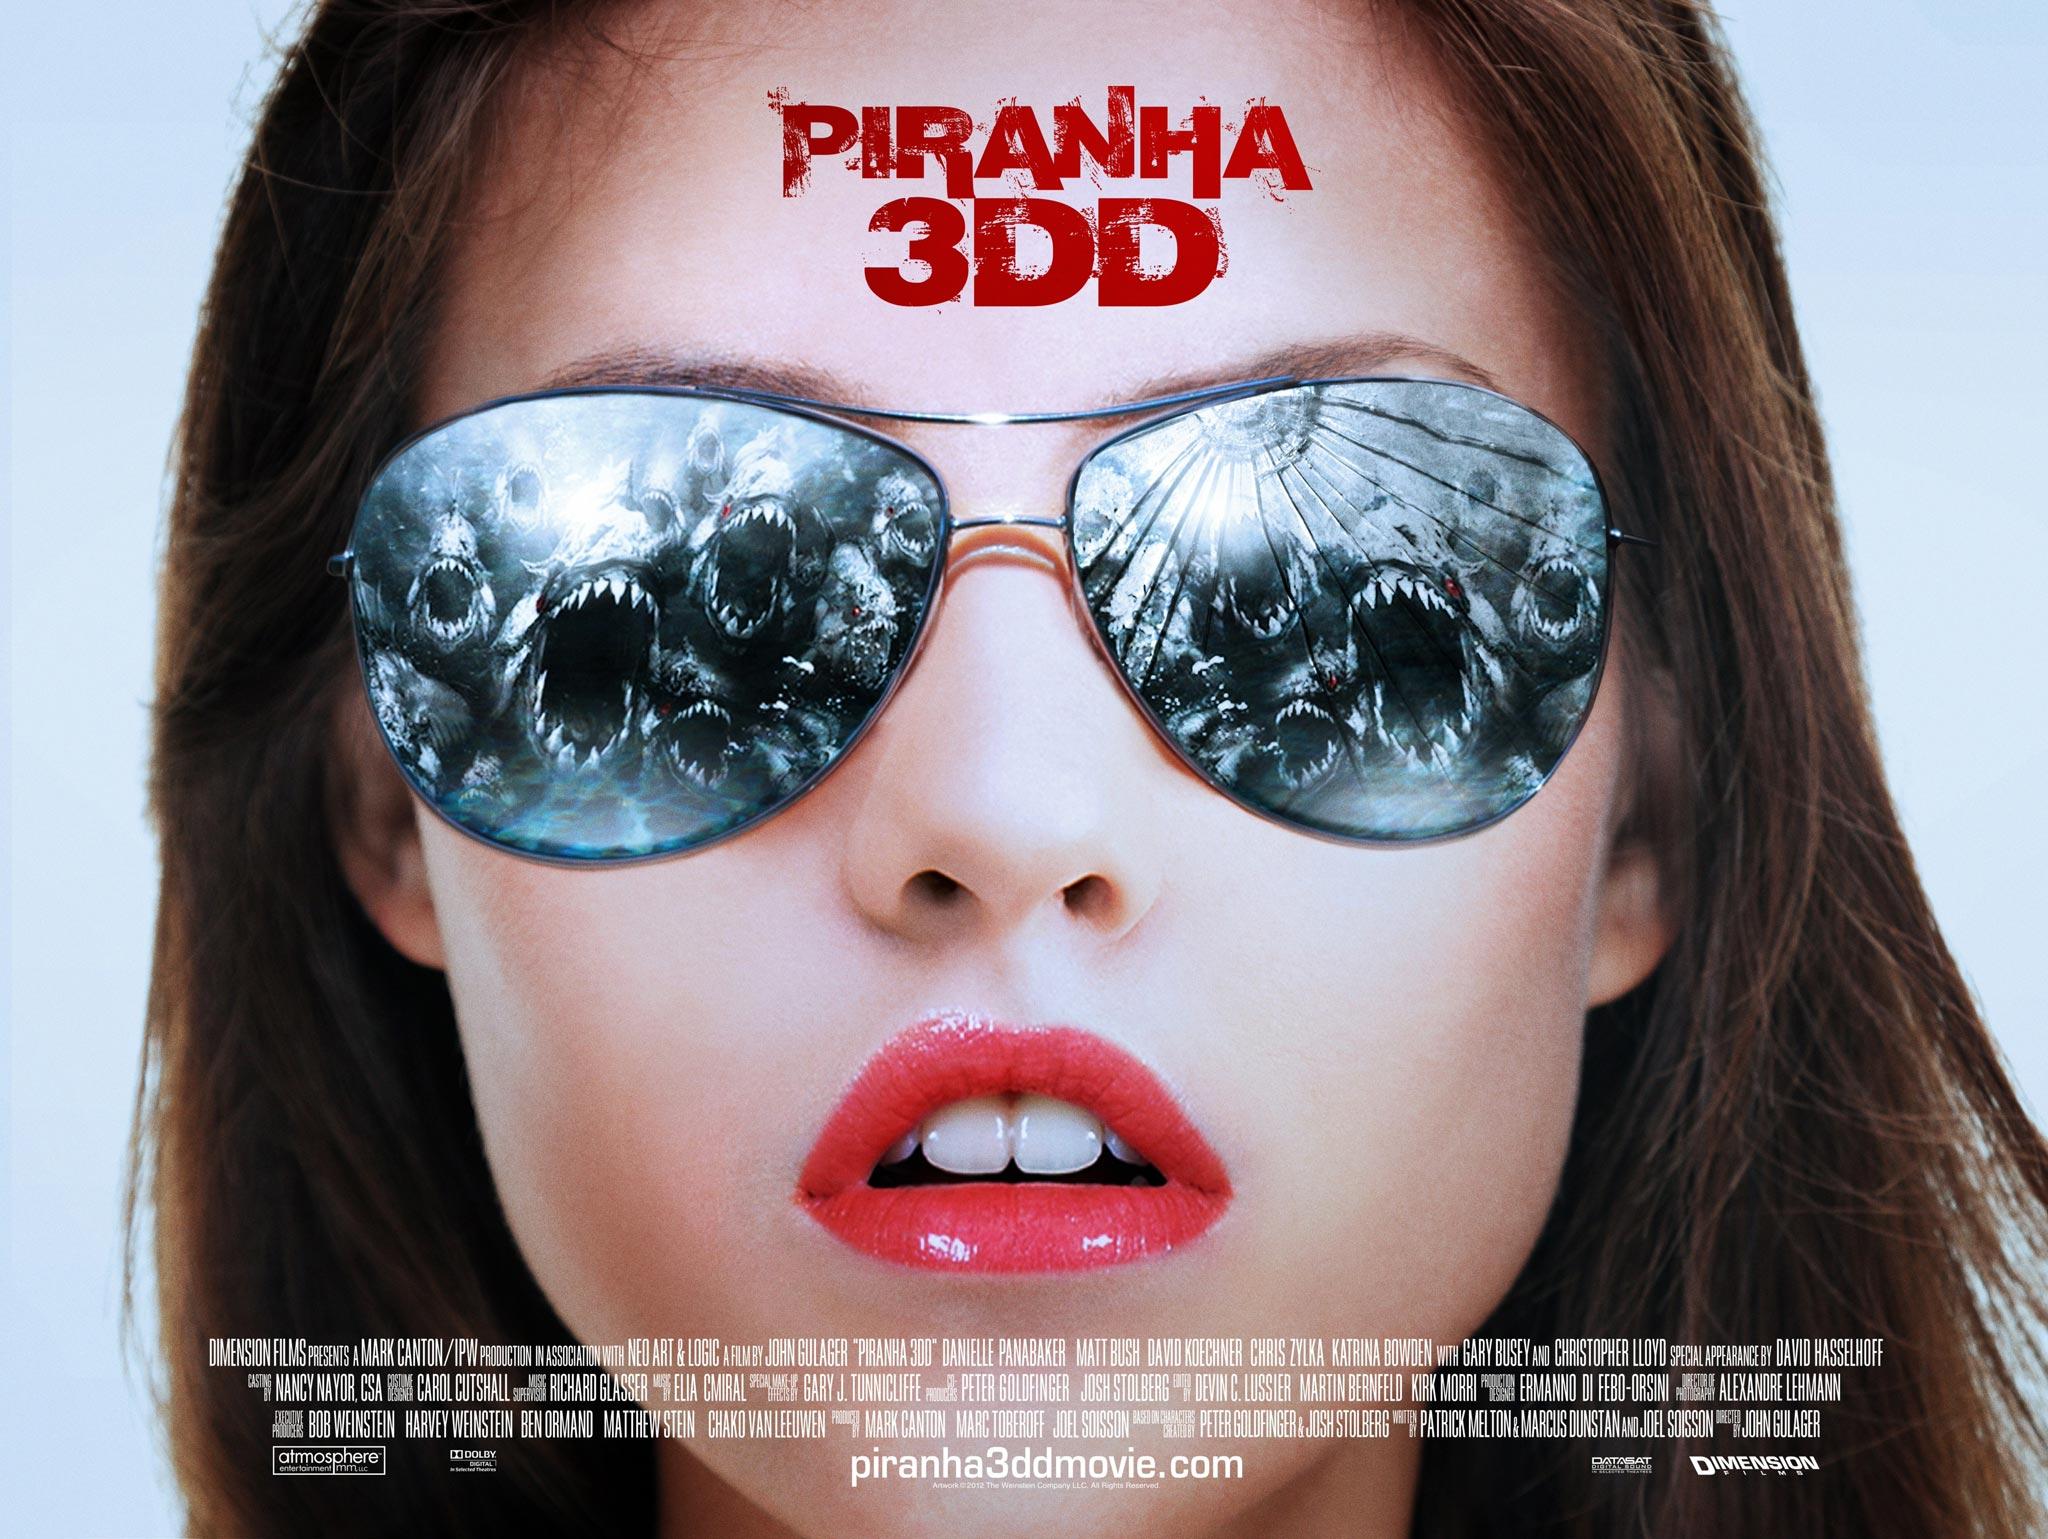 http://www.filmofilia.com/wp-content/uploads/2012/03/pirahna-3dd-quad-poster.jpg